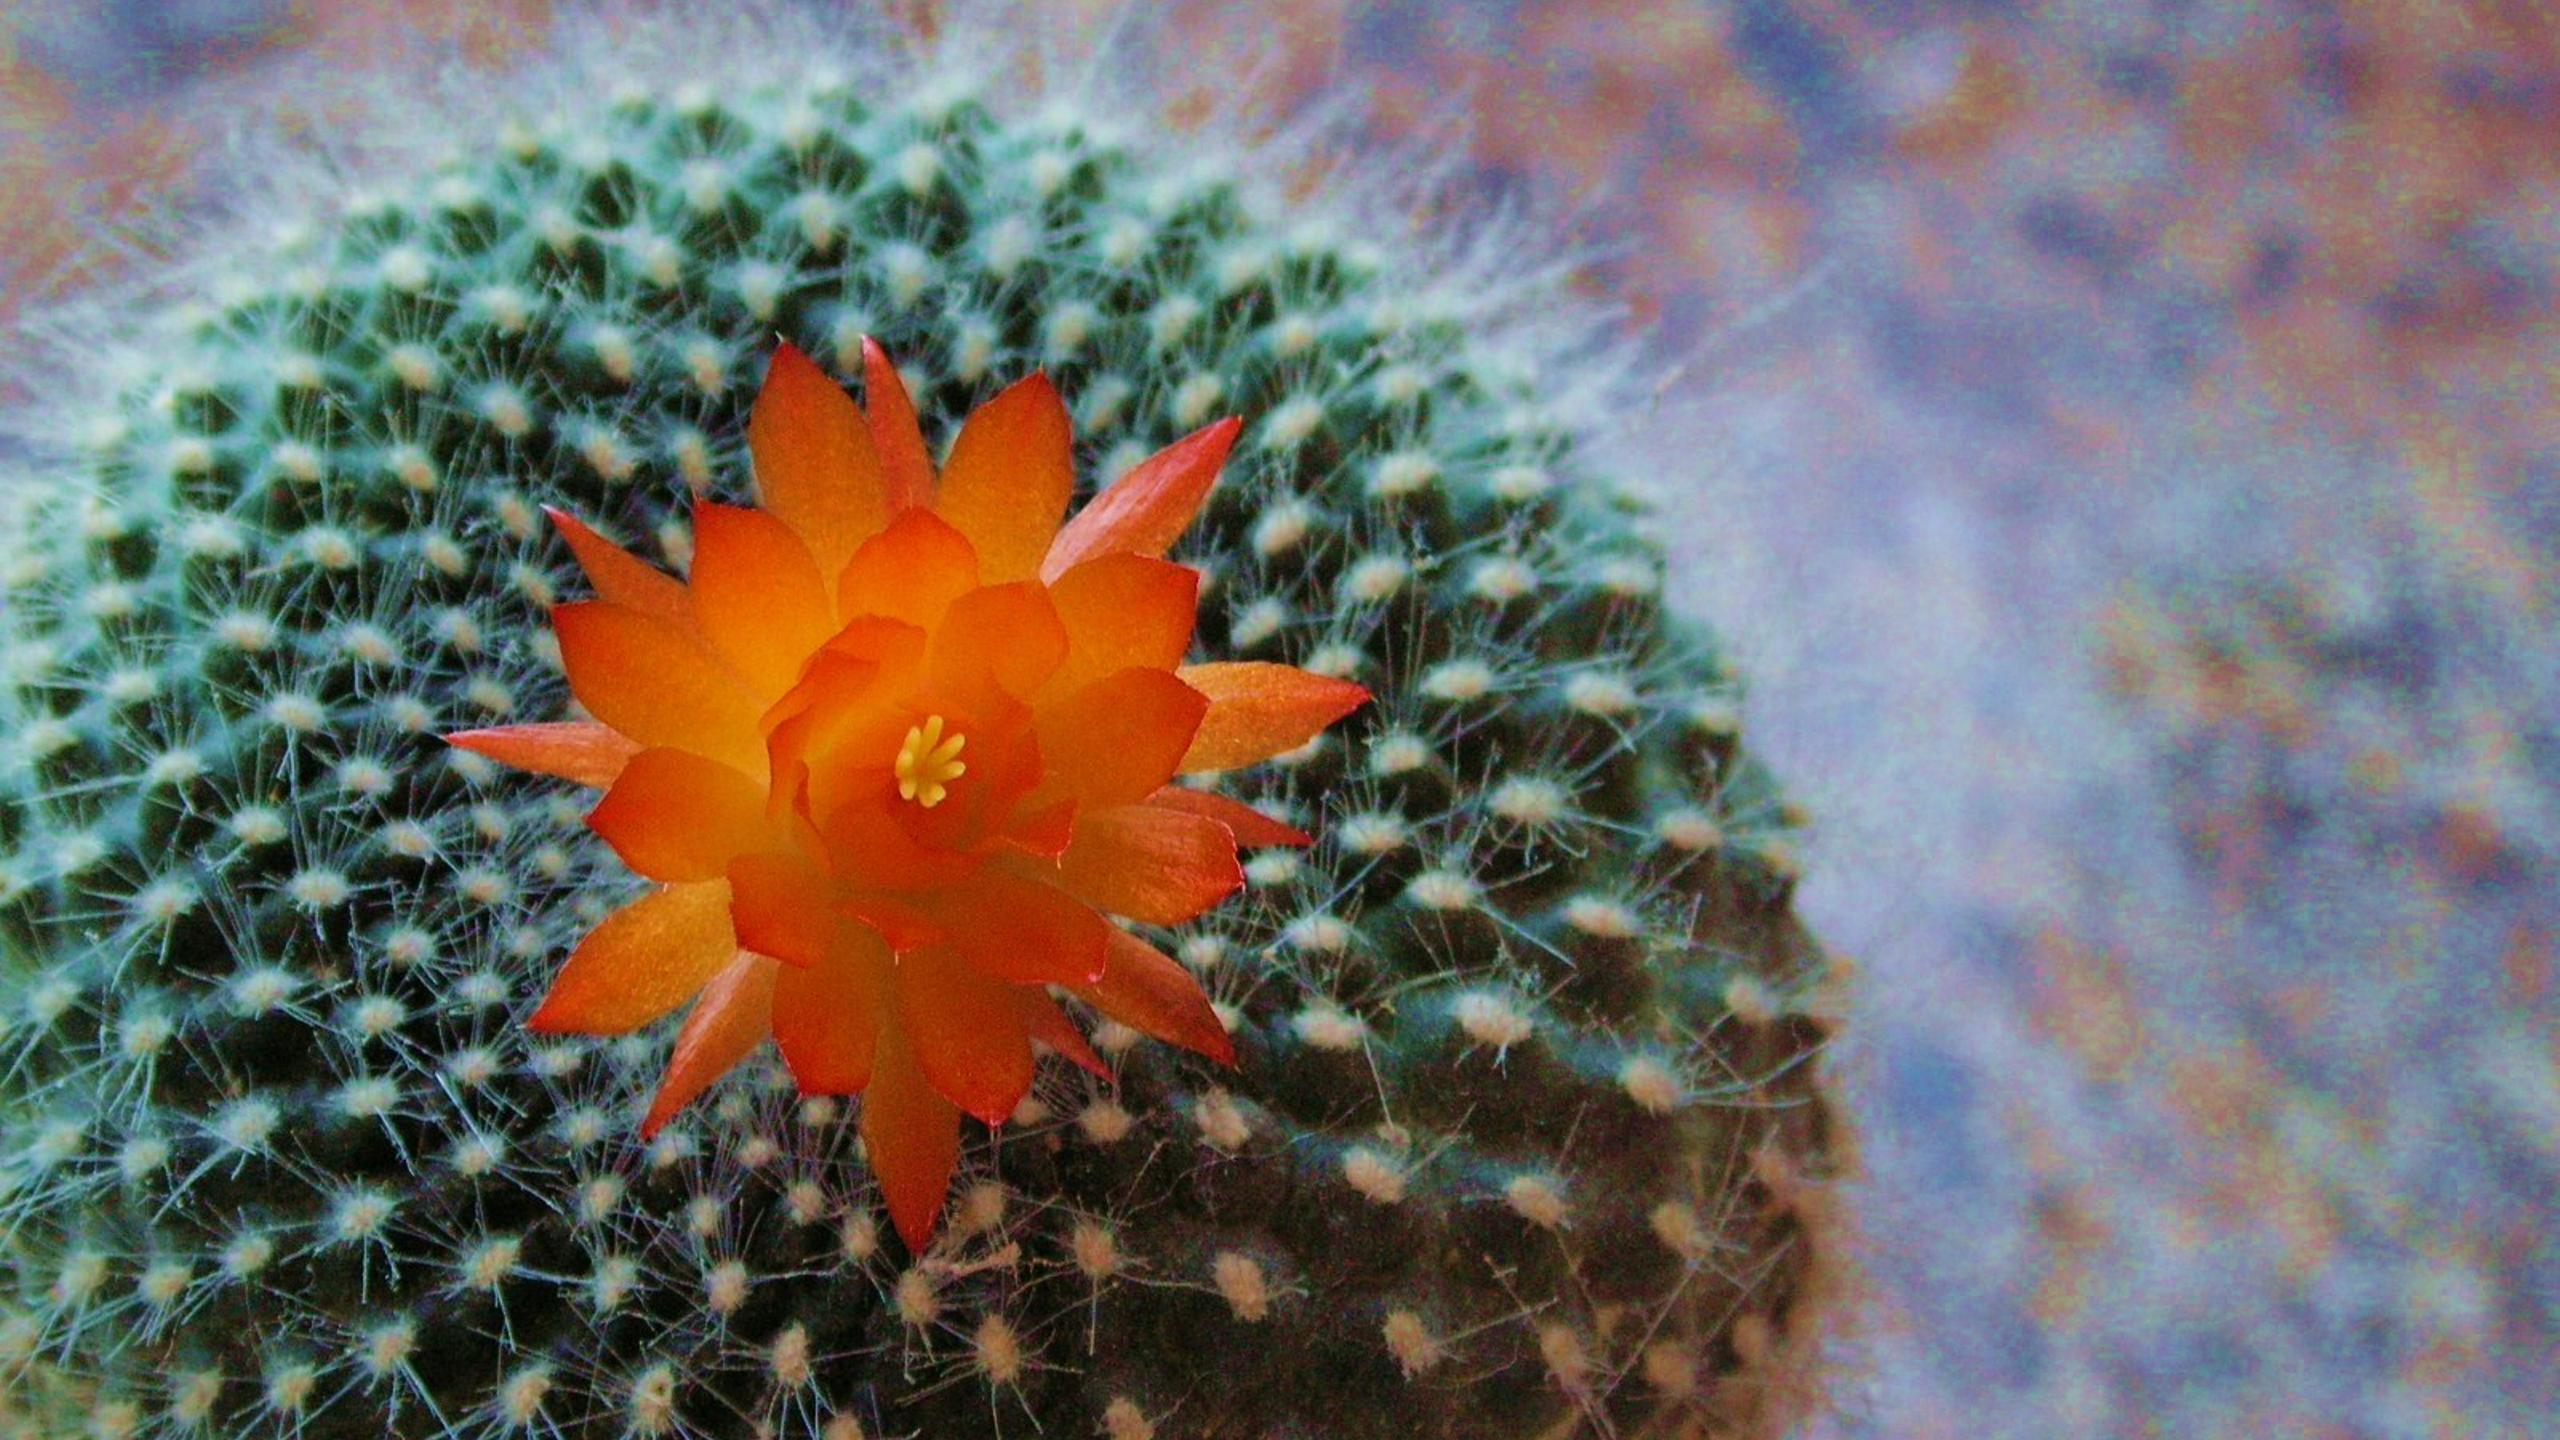 Macro Orange Cactus Flower Beautiful Plant From Desert Wallpaper